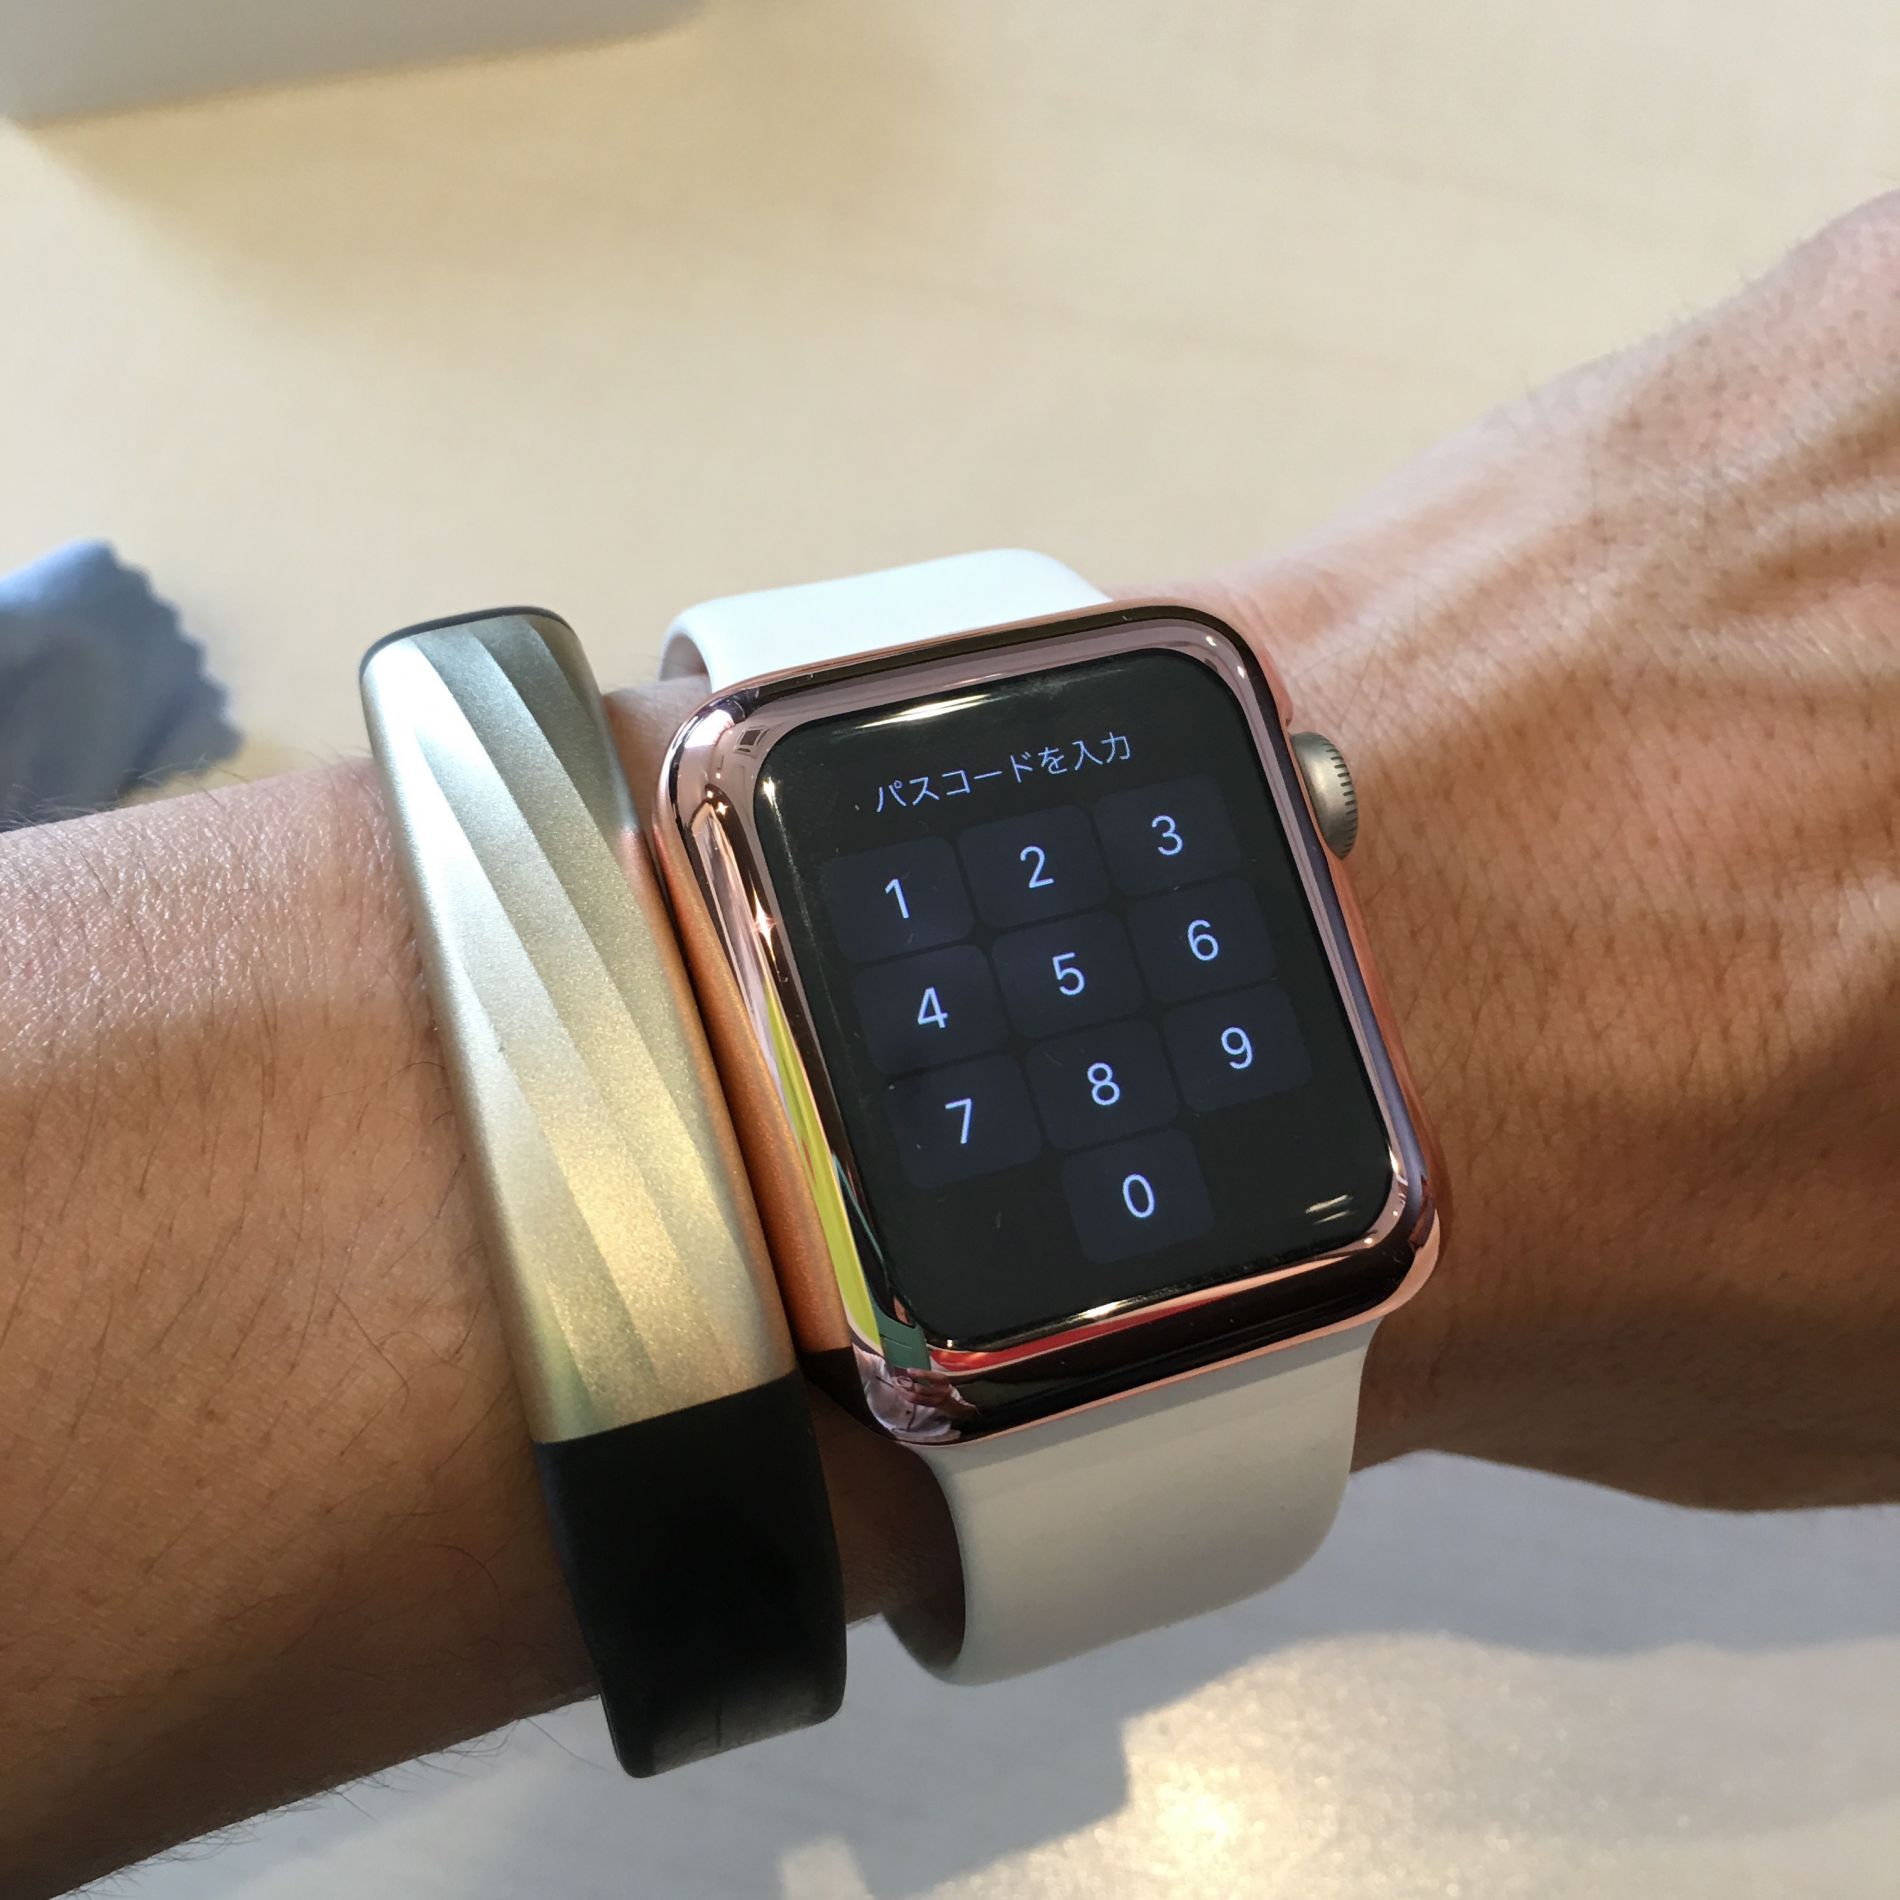 Apple Watchの薄くて全面保護してくれるフルカバーケースを買いました